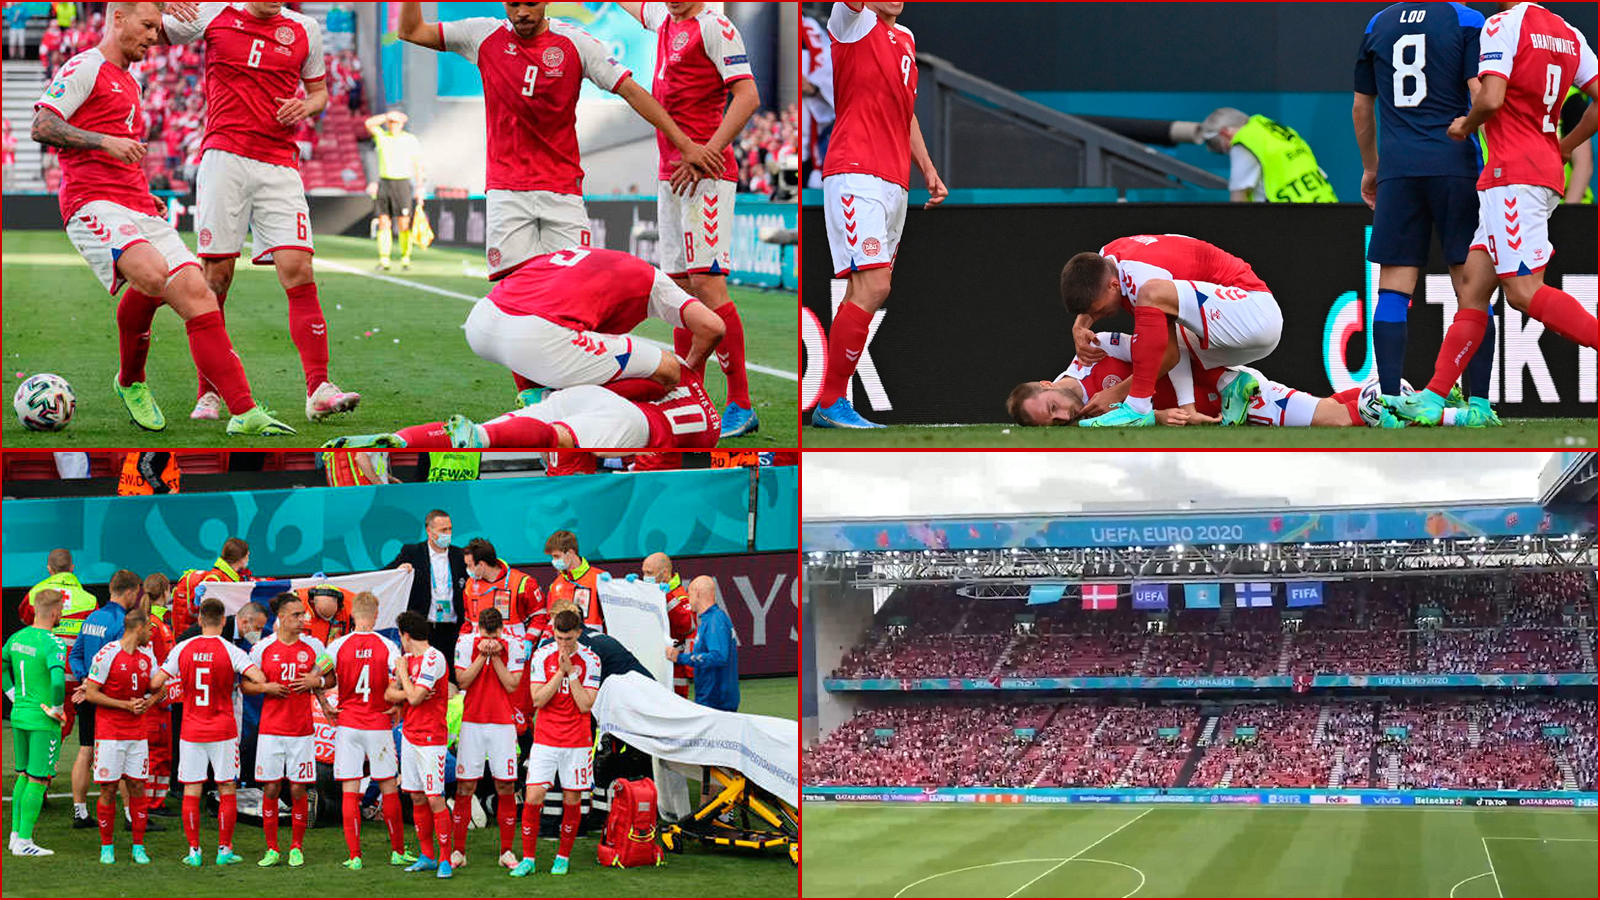 euro-2020-fans-cheer-for-denmarks-christian-eriksen-who-collapsed-on-field